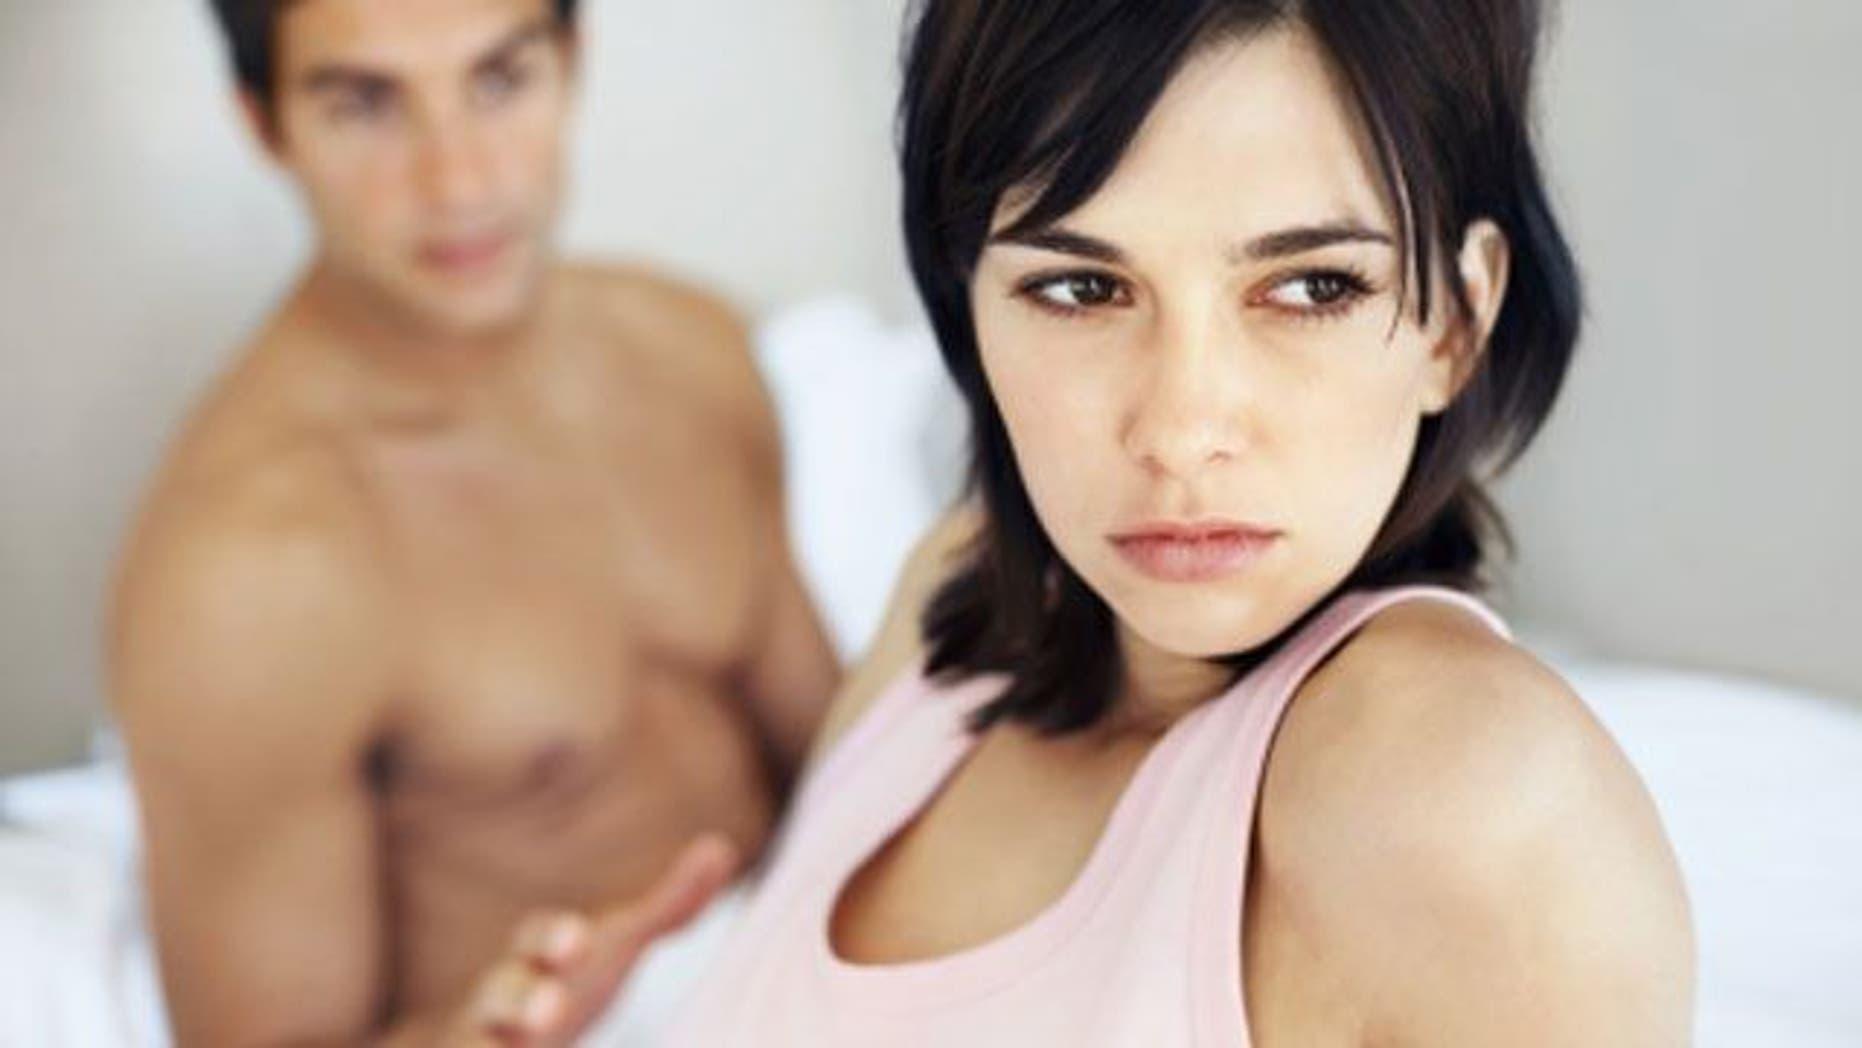 Feeling Pain When Having Sex